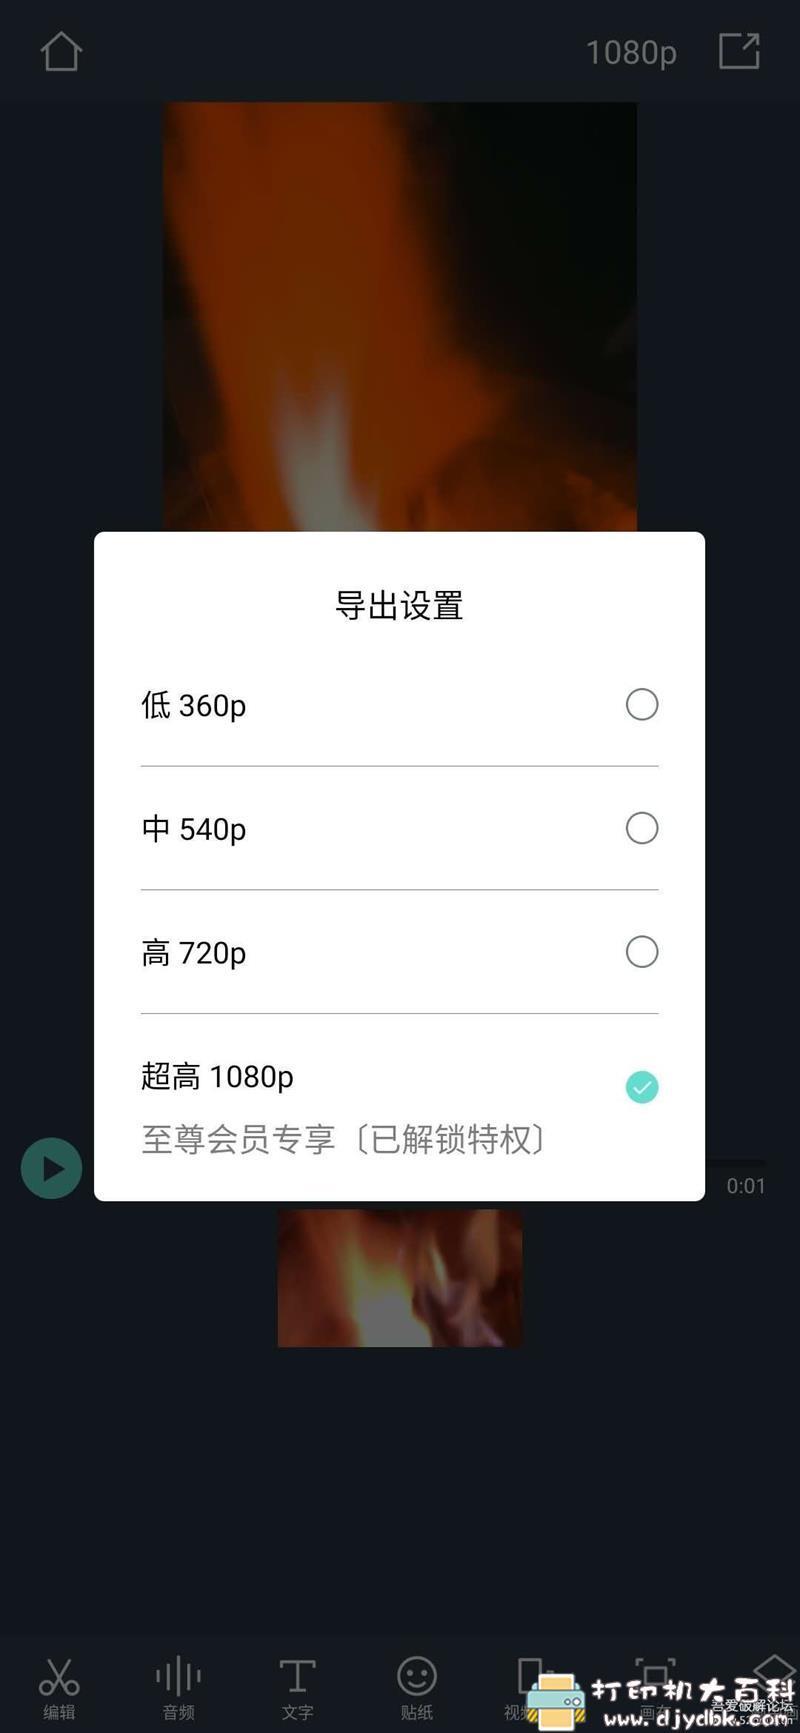 [Android]手机剪辑软件 Filmora喵影工厂图片 No.2